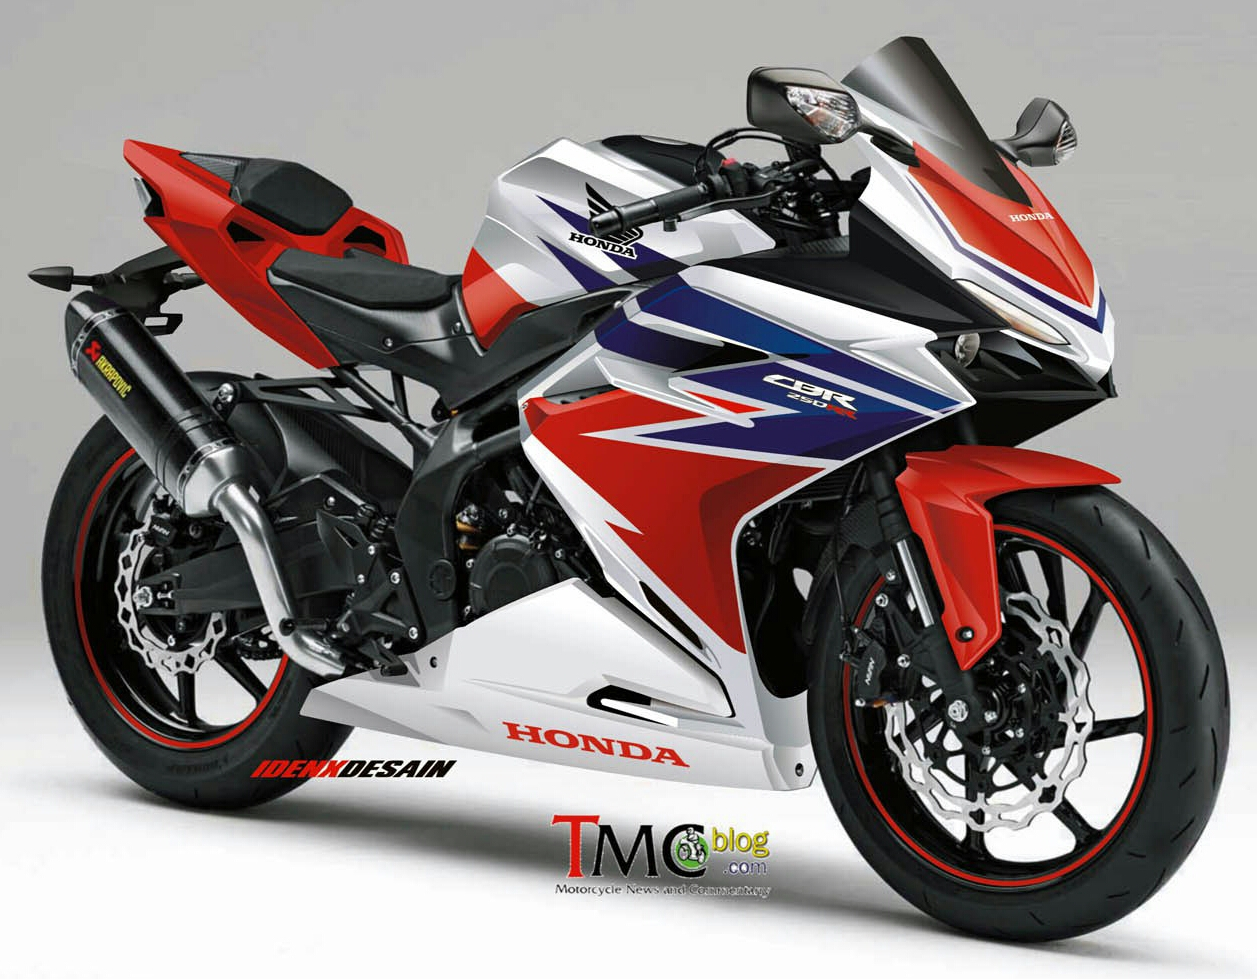 100 Gambar Motor Honda Cbr 250 Terupdate  Gubuk Modifikasi